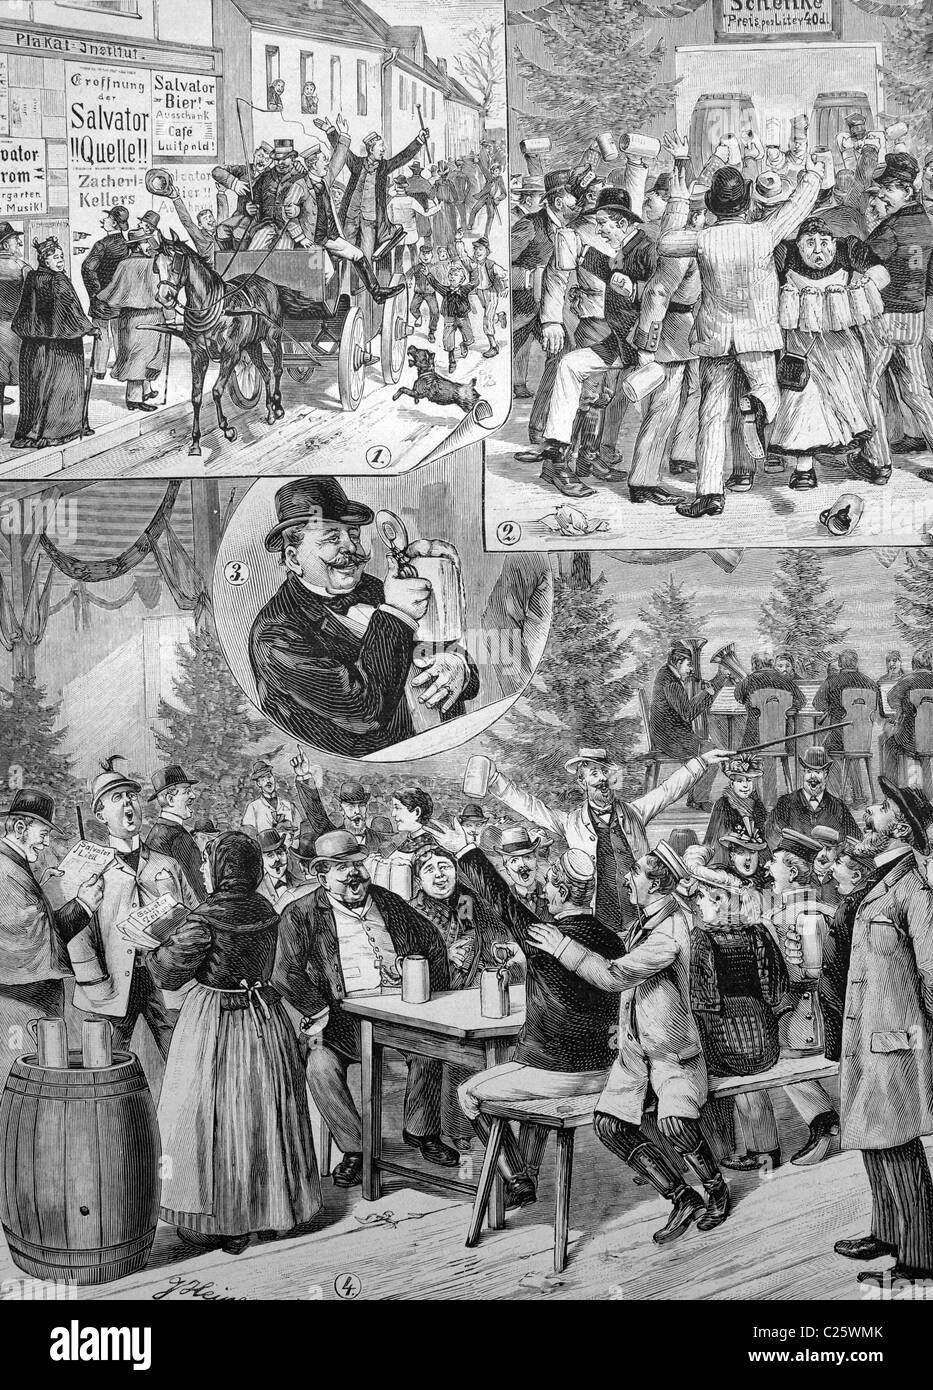 The Salvator beer bar in Munich, Bavaria, Germany, historical illustration circa 1893 - Stock Image